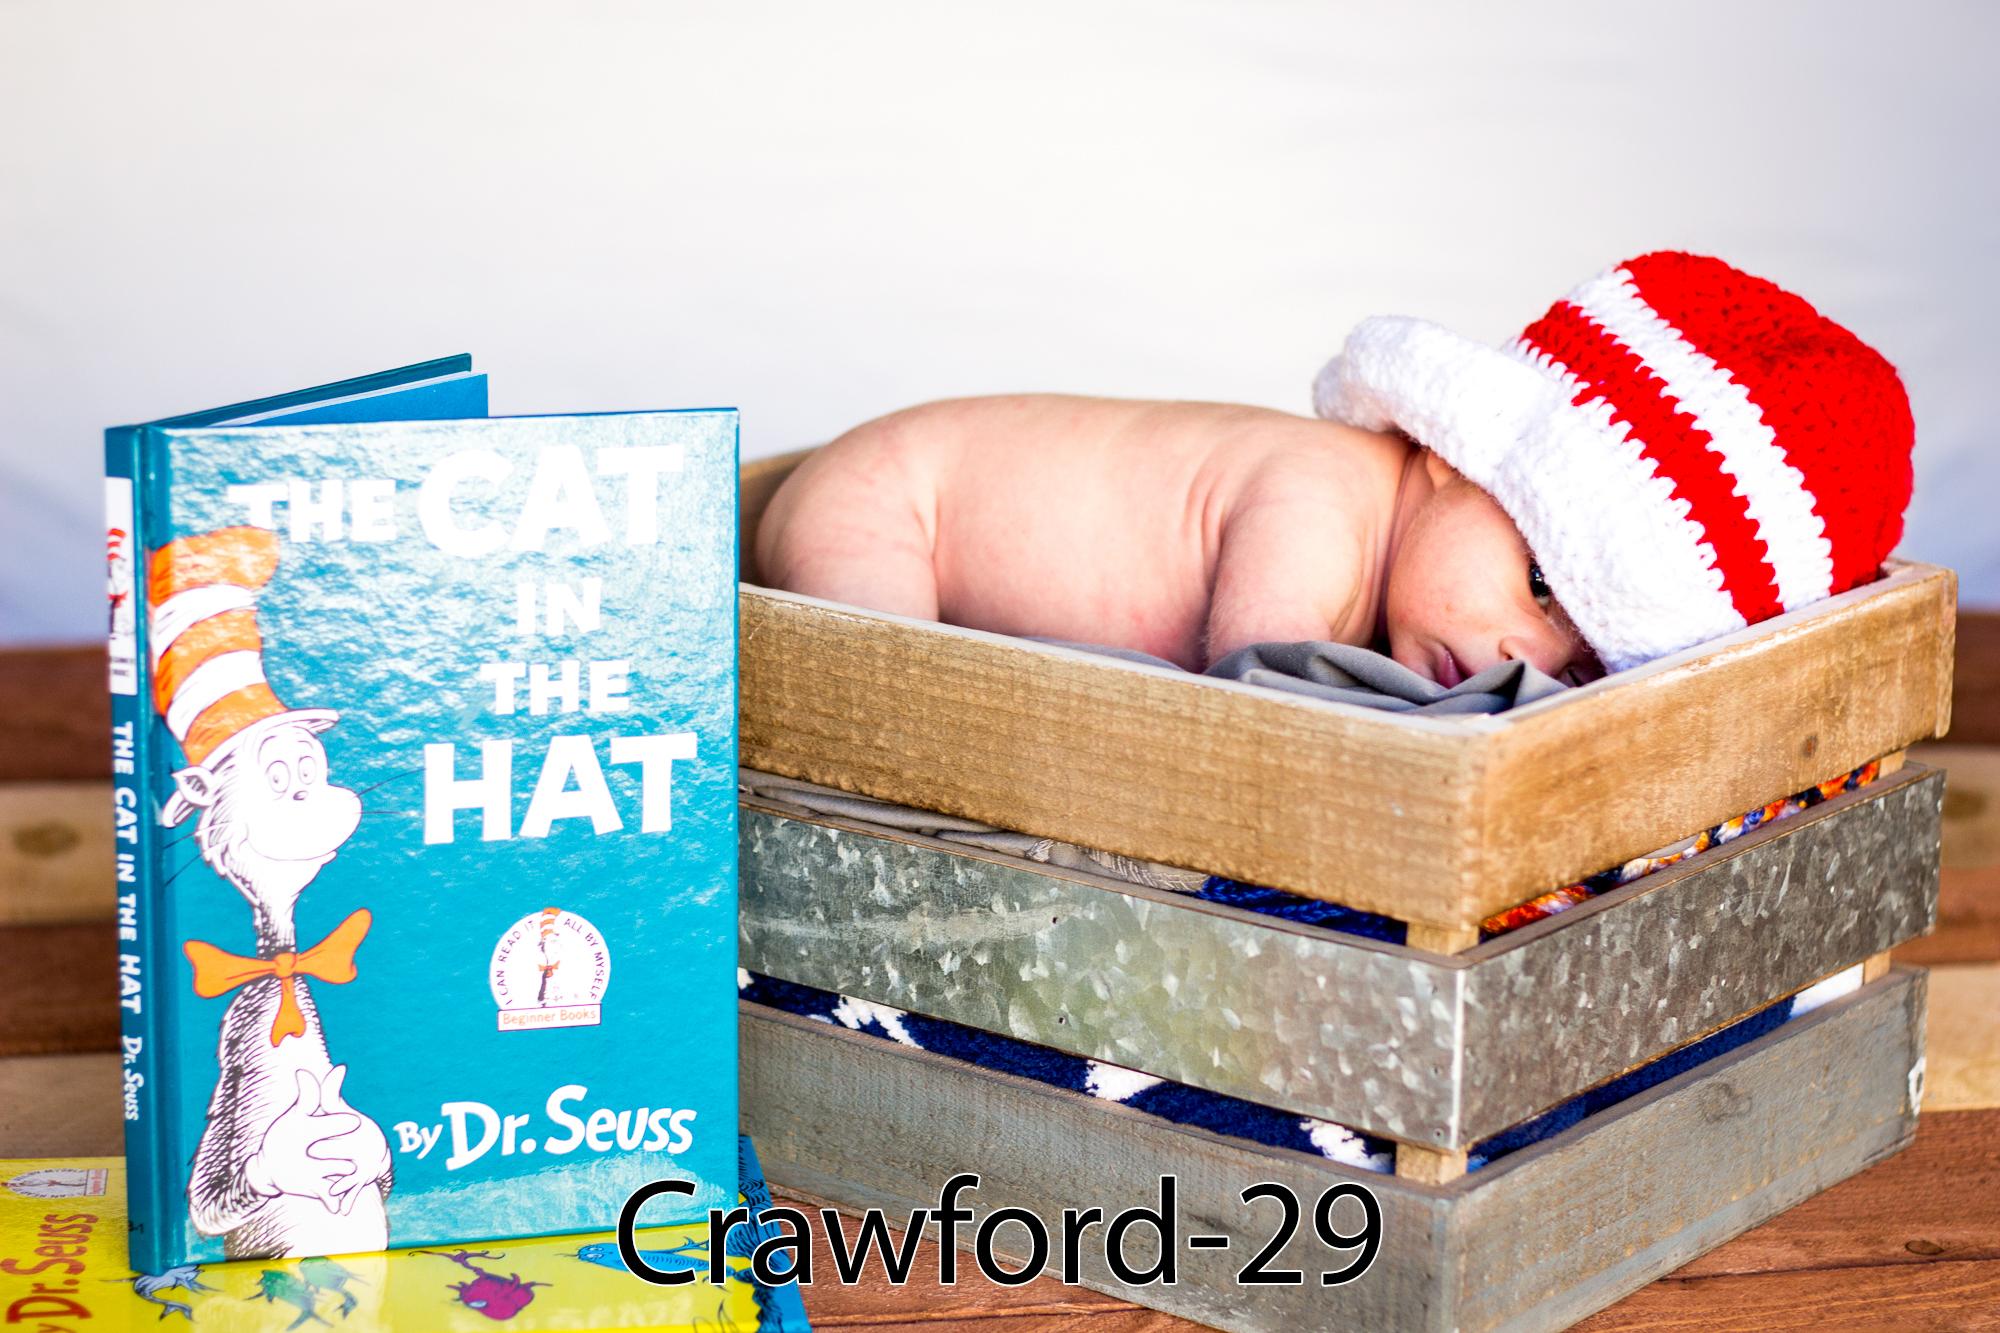 Crawford-29.jpg